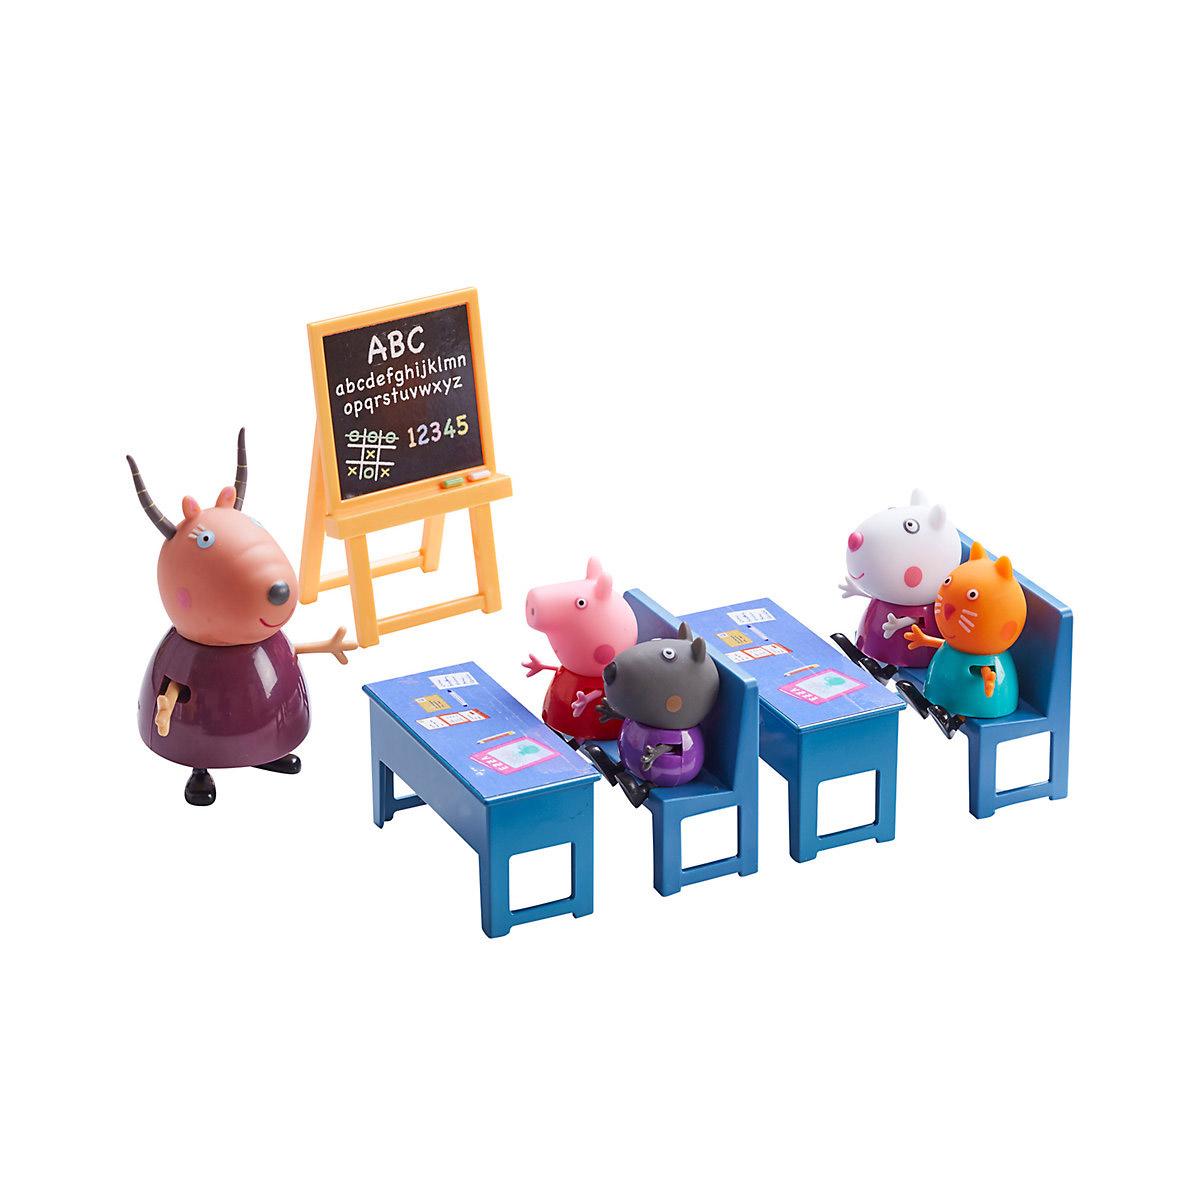 Figurines Avec 7 Classe PigLa Personnes Peppa VGSUqpzM